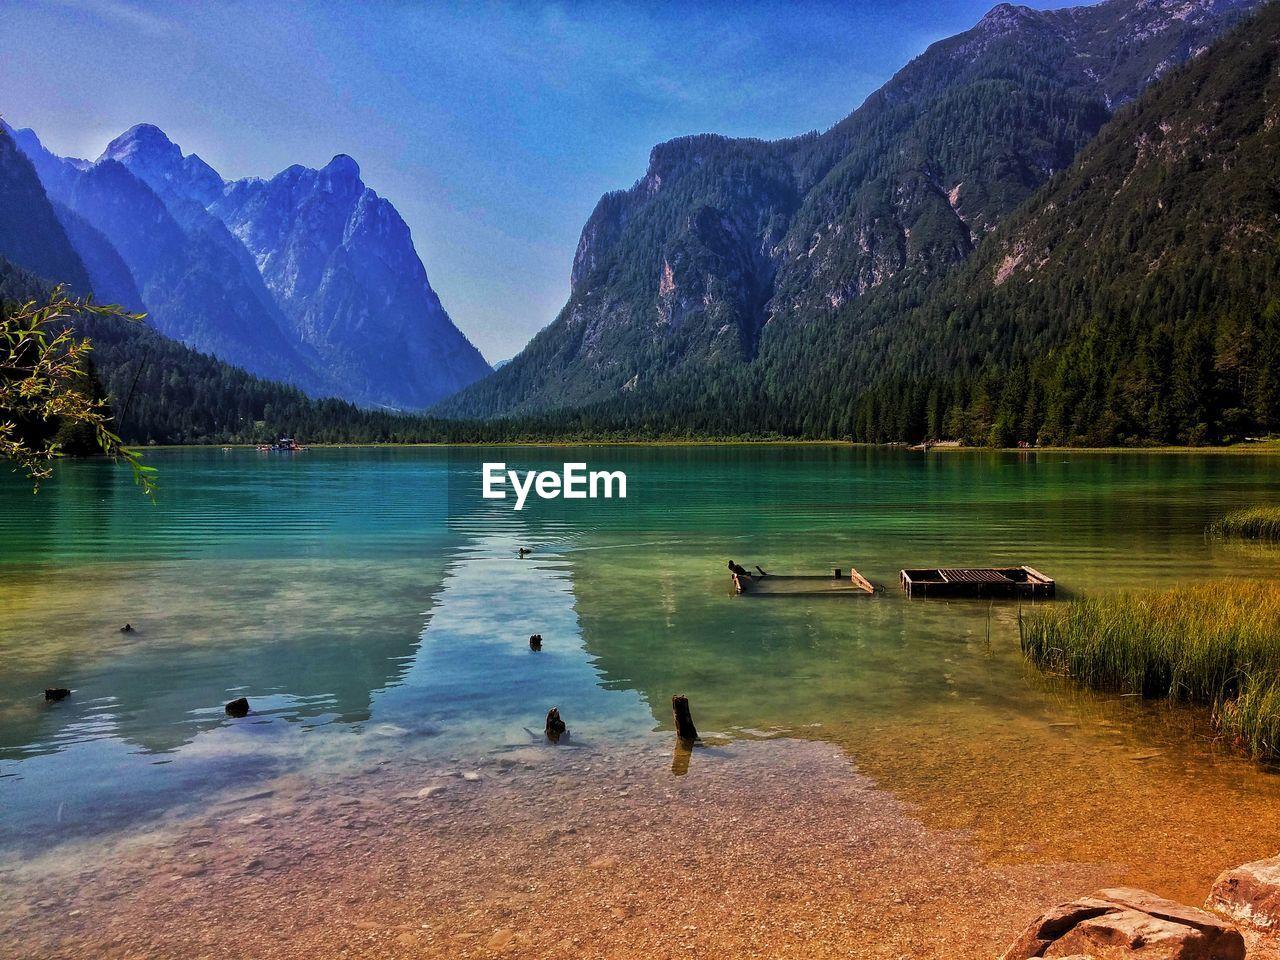 mountain, water, beauty in nature, scenics - nature, lake, mountain range, tranquil scene, tranquility, nature, sky, idyllic, day, non-urban scene, tree, reflection, plant, bird, no people, vertebrate, outdoors